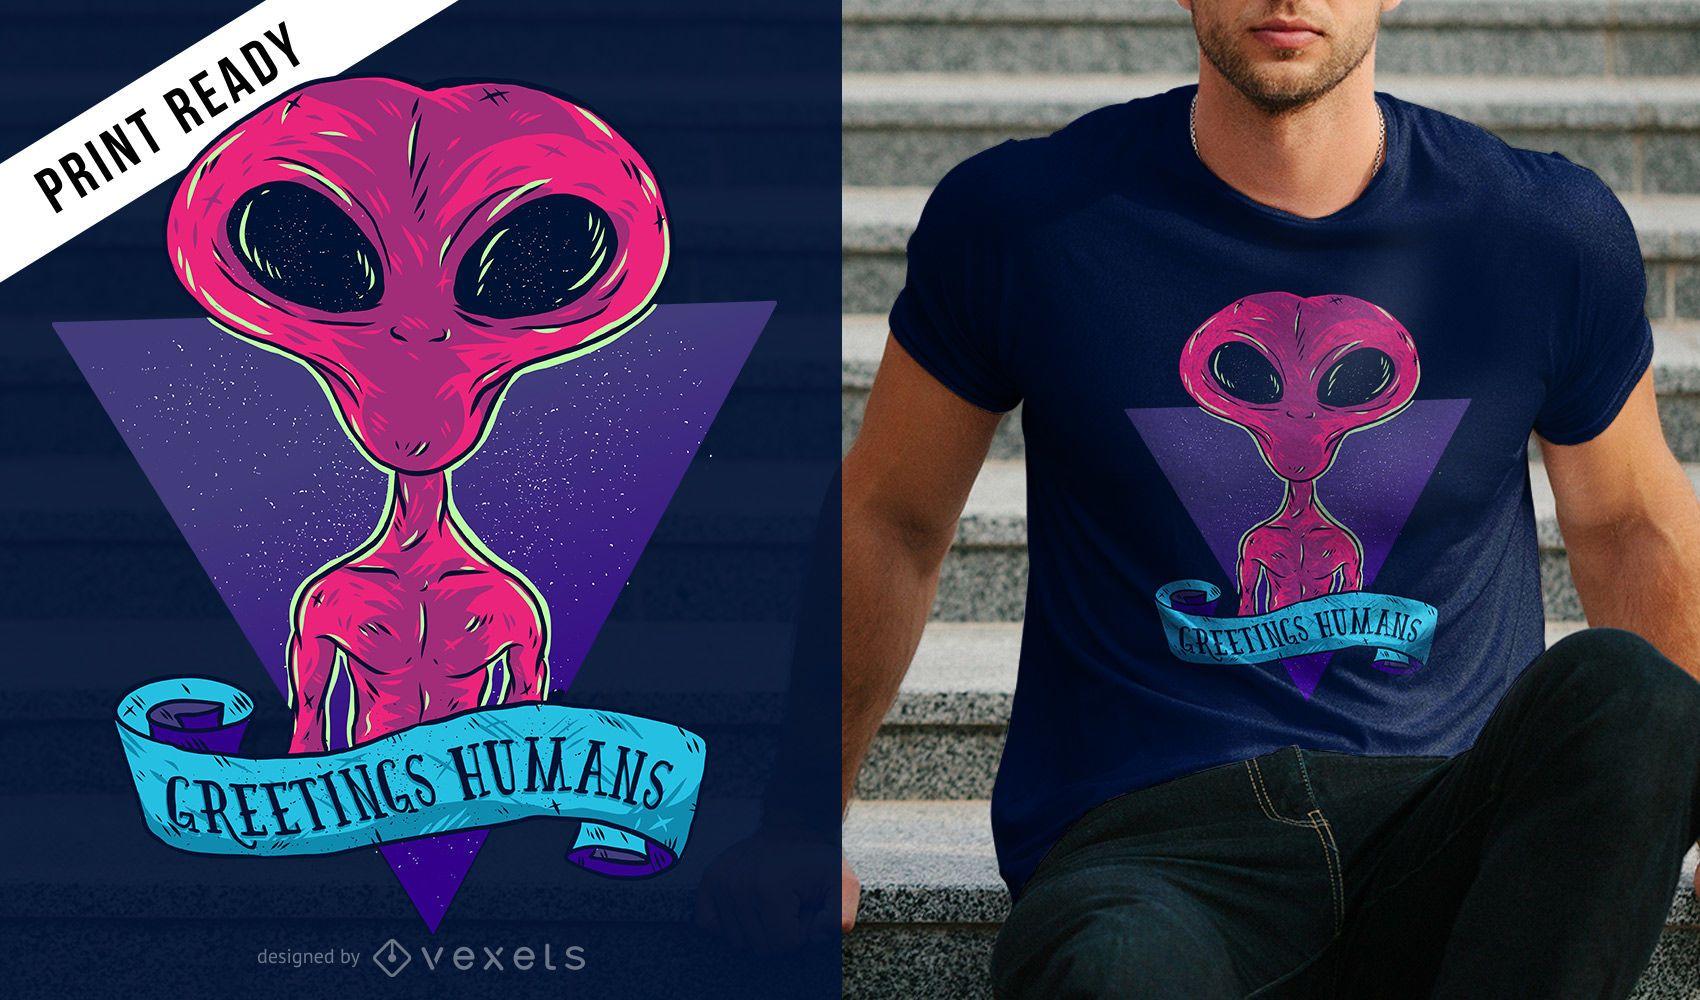 Greetings humans t-shirt design